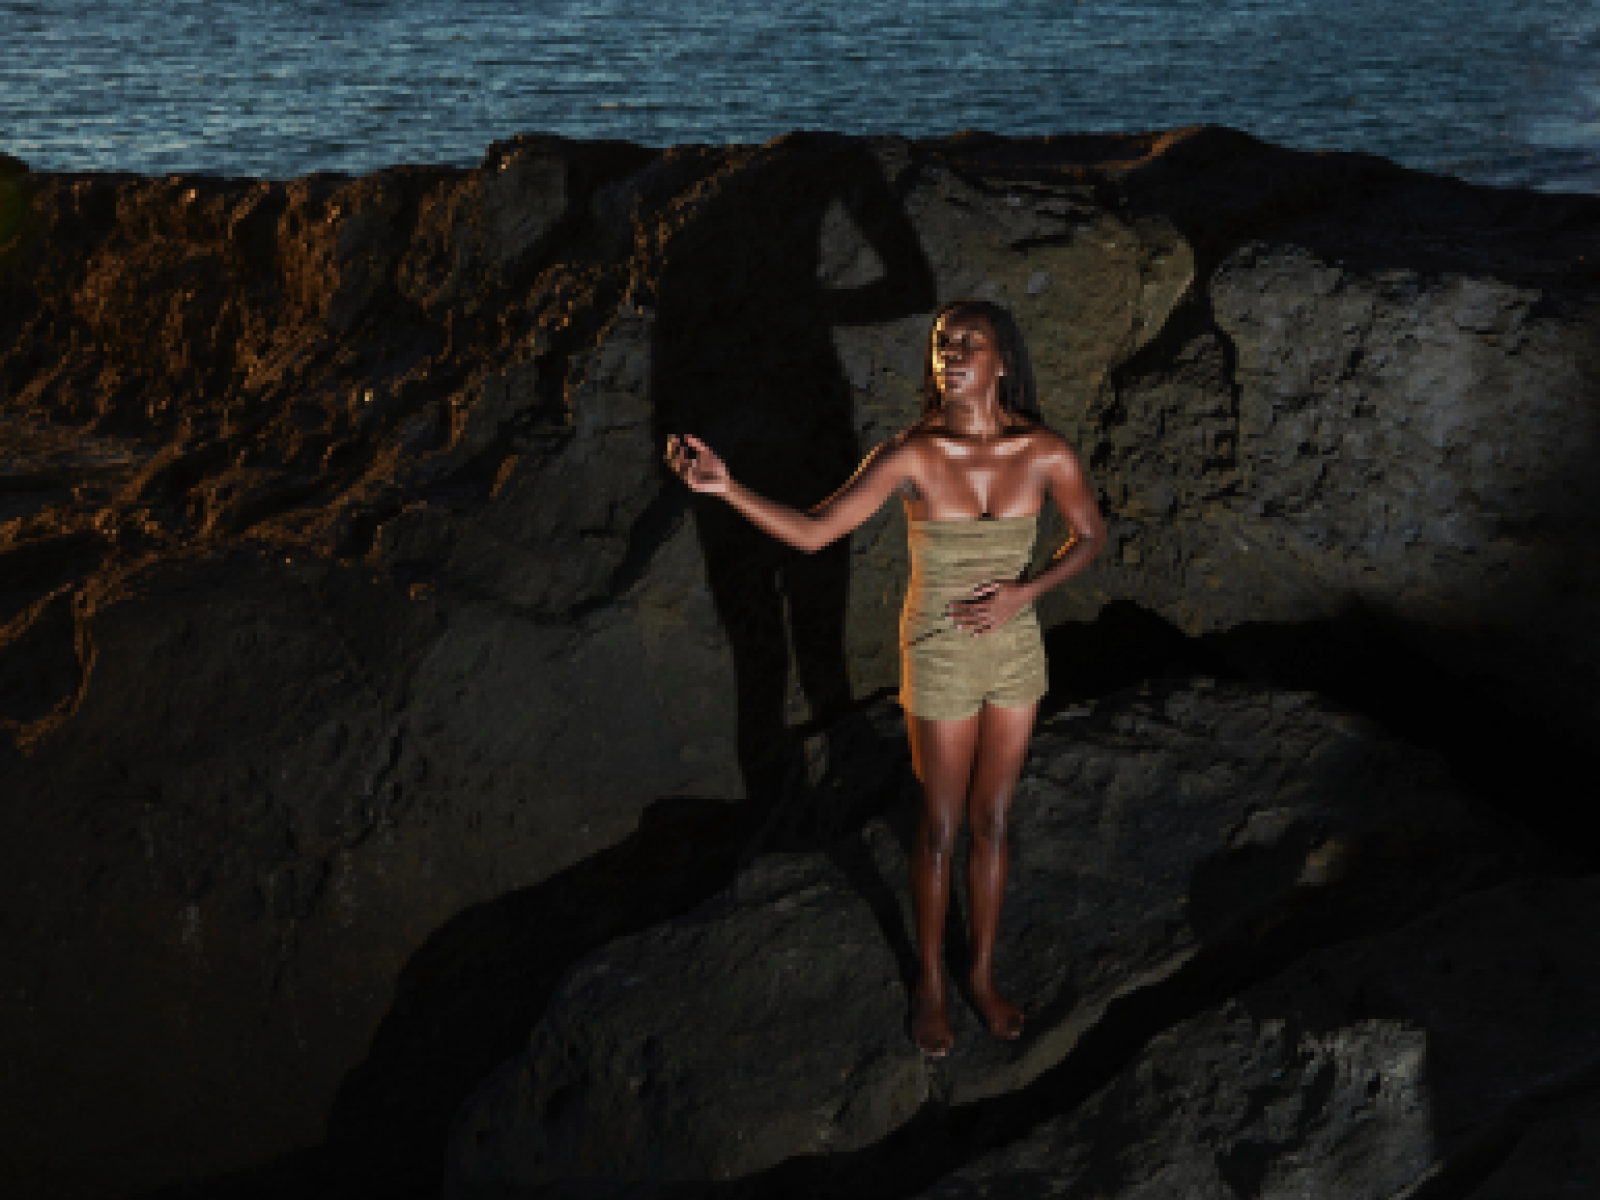 Main image for event titled Jessica Emmanuel: ˈkwirē/: by REDCAT